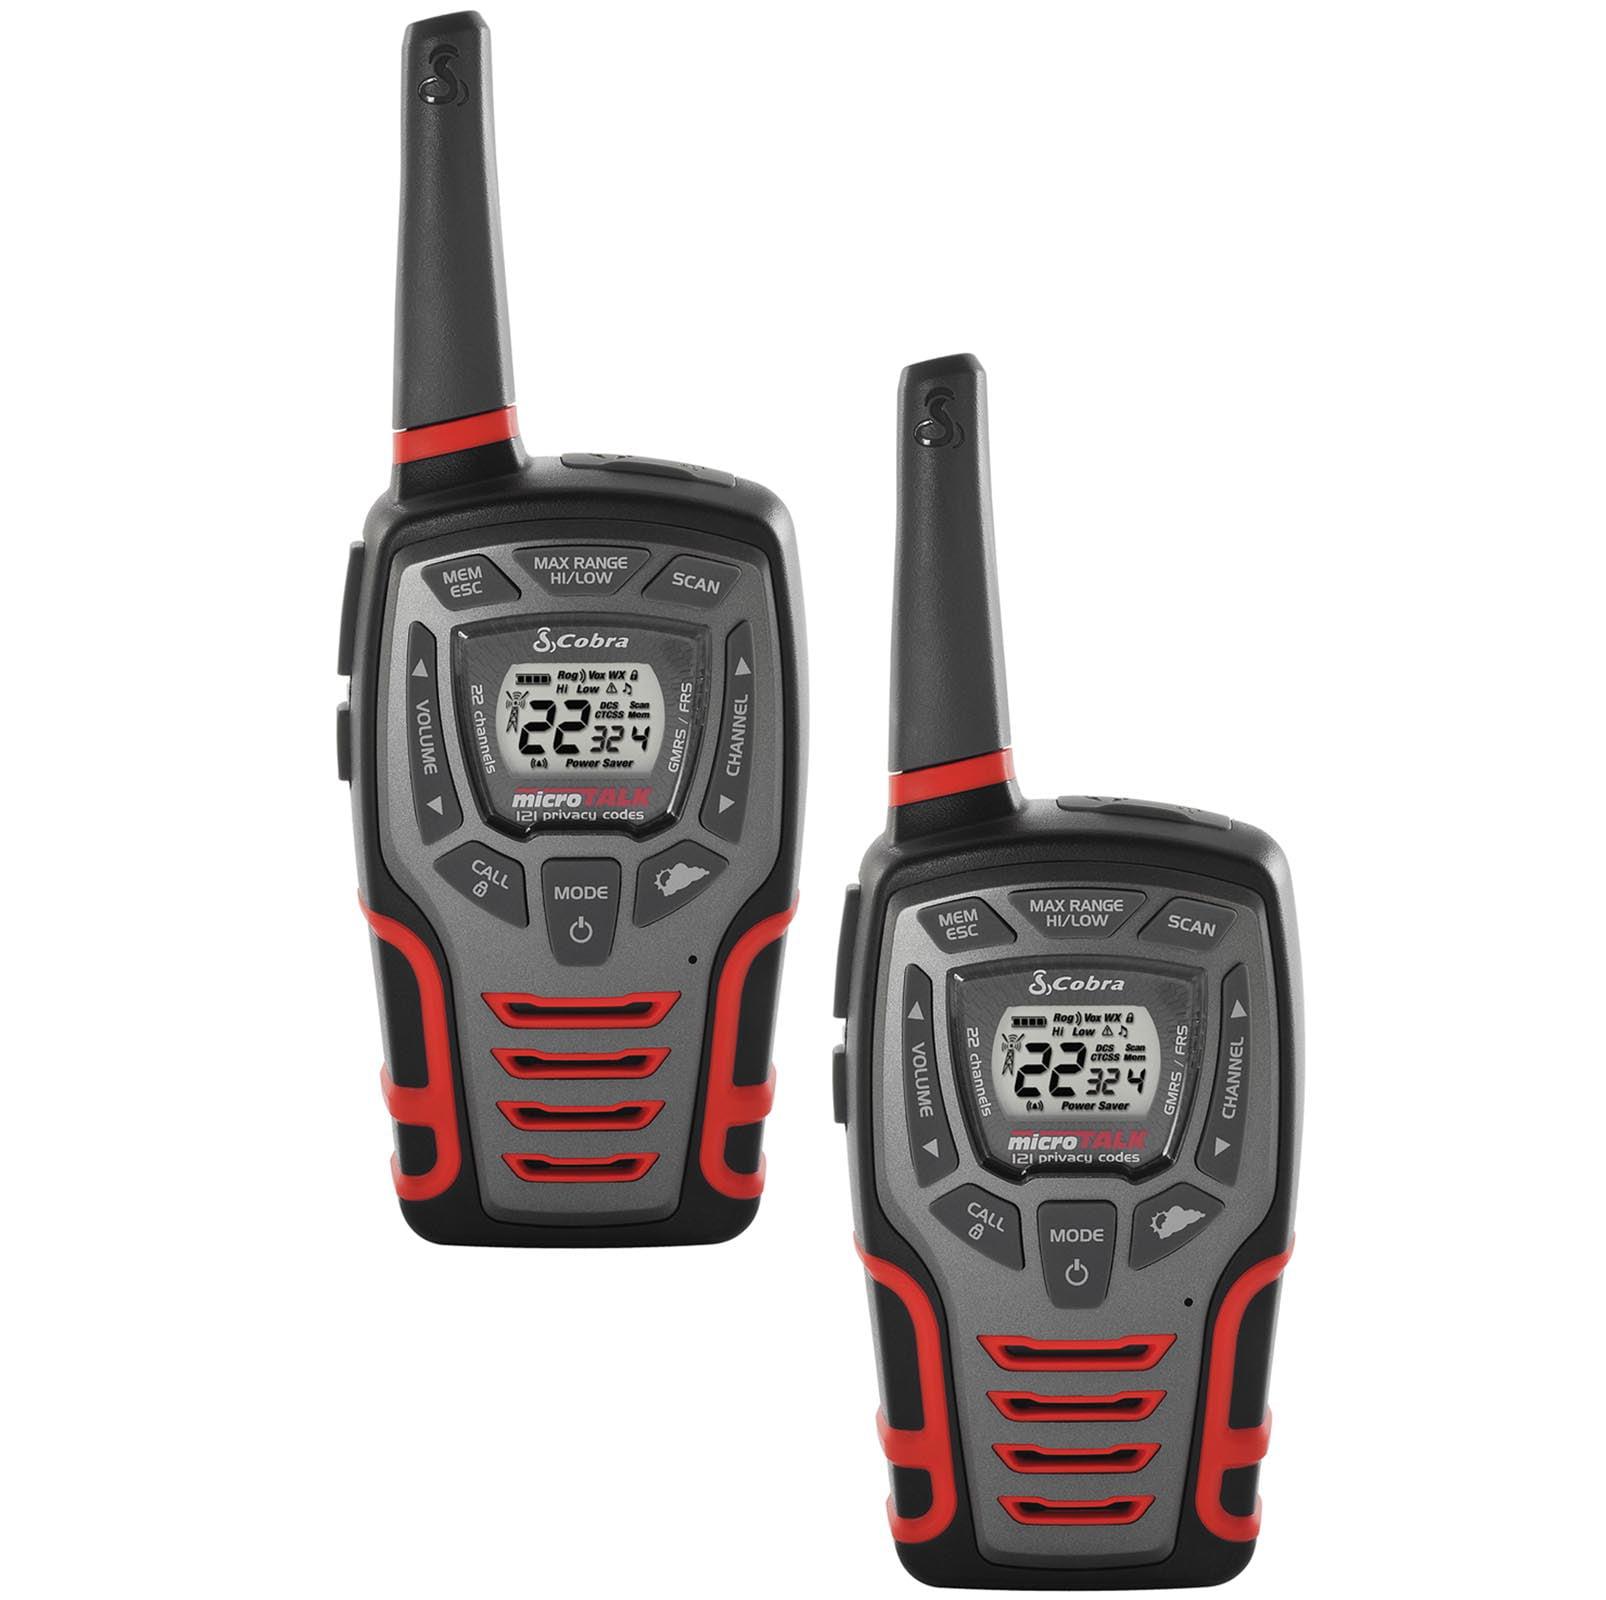 (4) COBRA MicroTalk 32 Mile 22 Channel Walkie Talkie 2-Way Radios w/Vox |  CXT595 [Refurbished] - Walmart.com